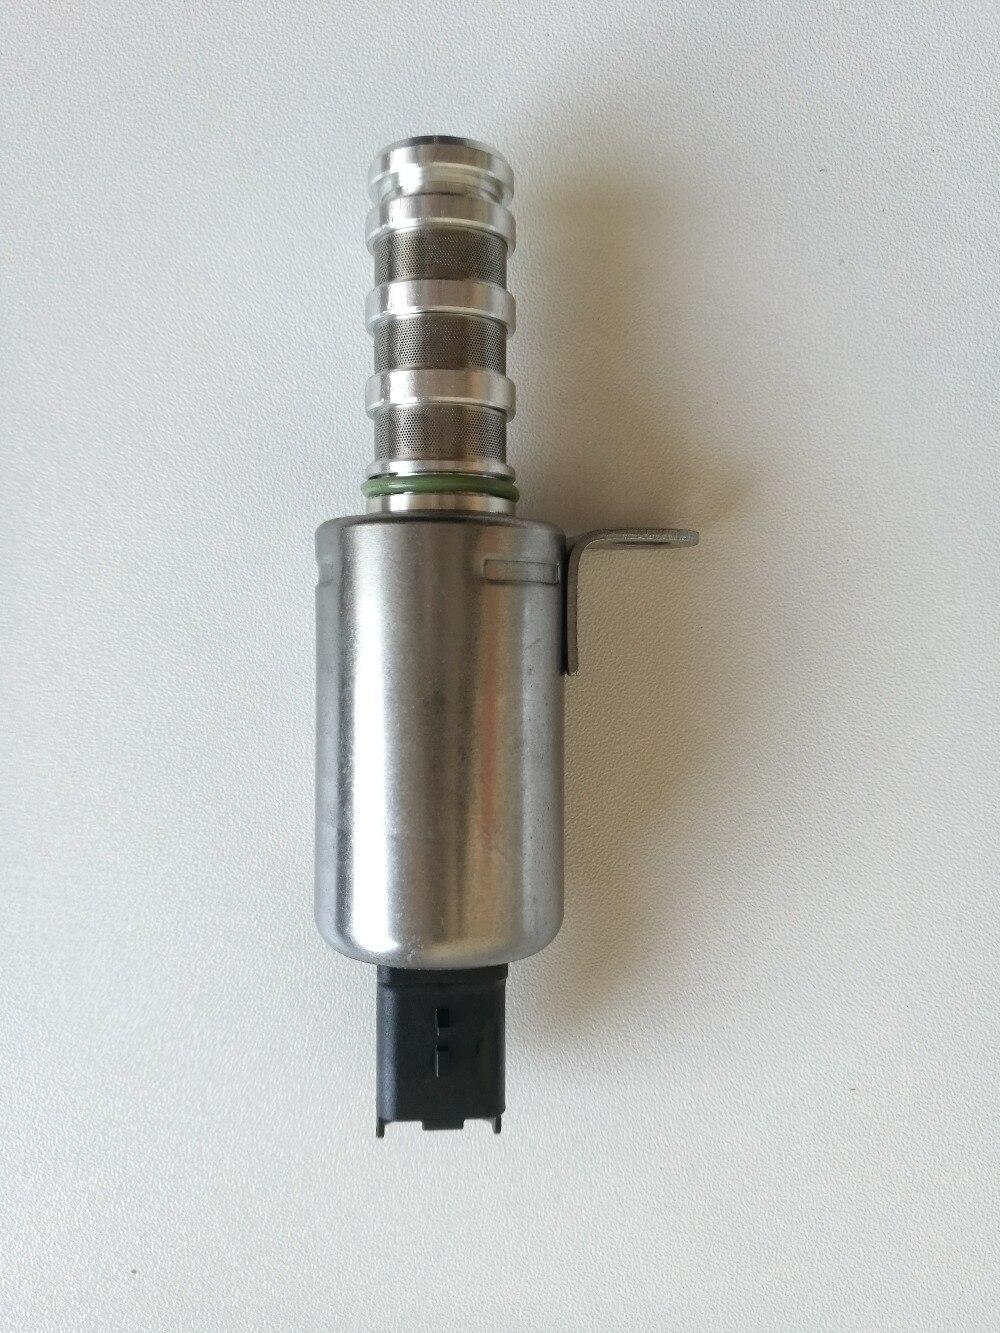 VVT Oil Control Valve Timing Control Solenoid For Mini BMW 11367587760 11367604292 CITROEN PEUGEOT 1922R7 V758776080 1922V9